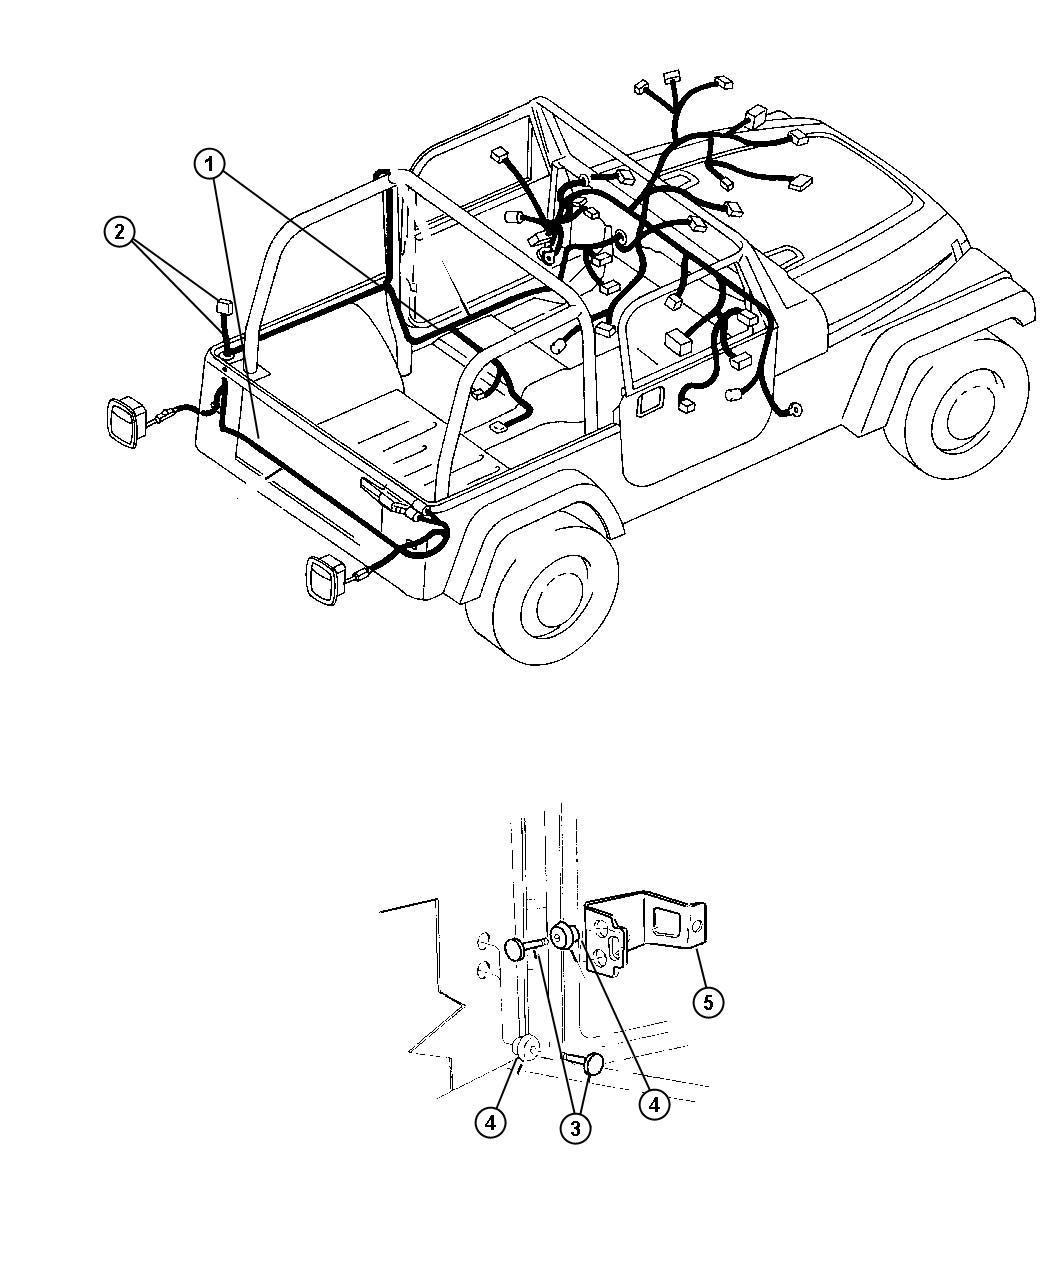 [DIAGRAM] Official Workshop Manual Service Repair For Jeep